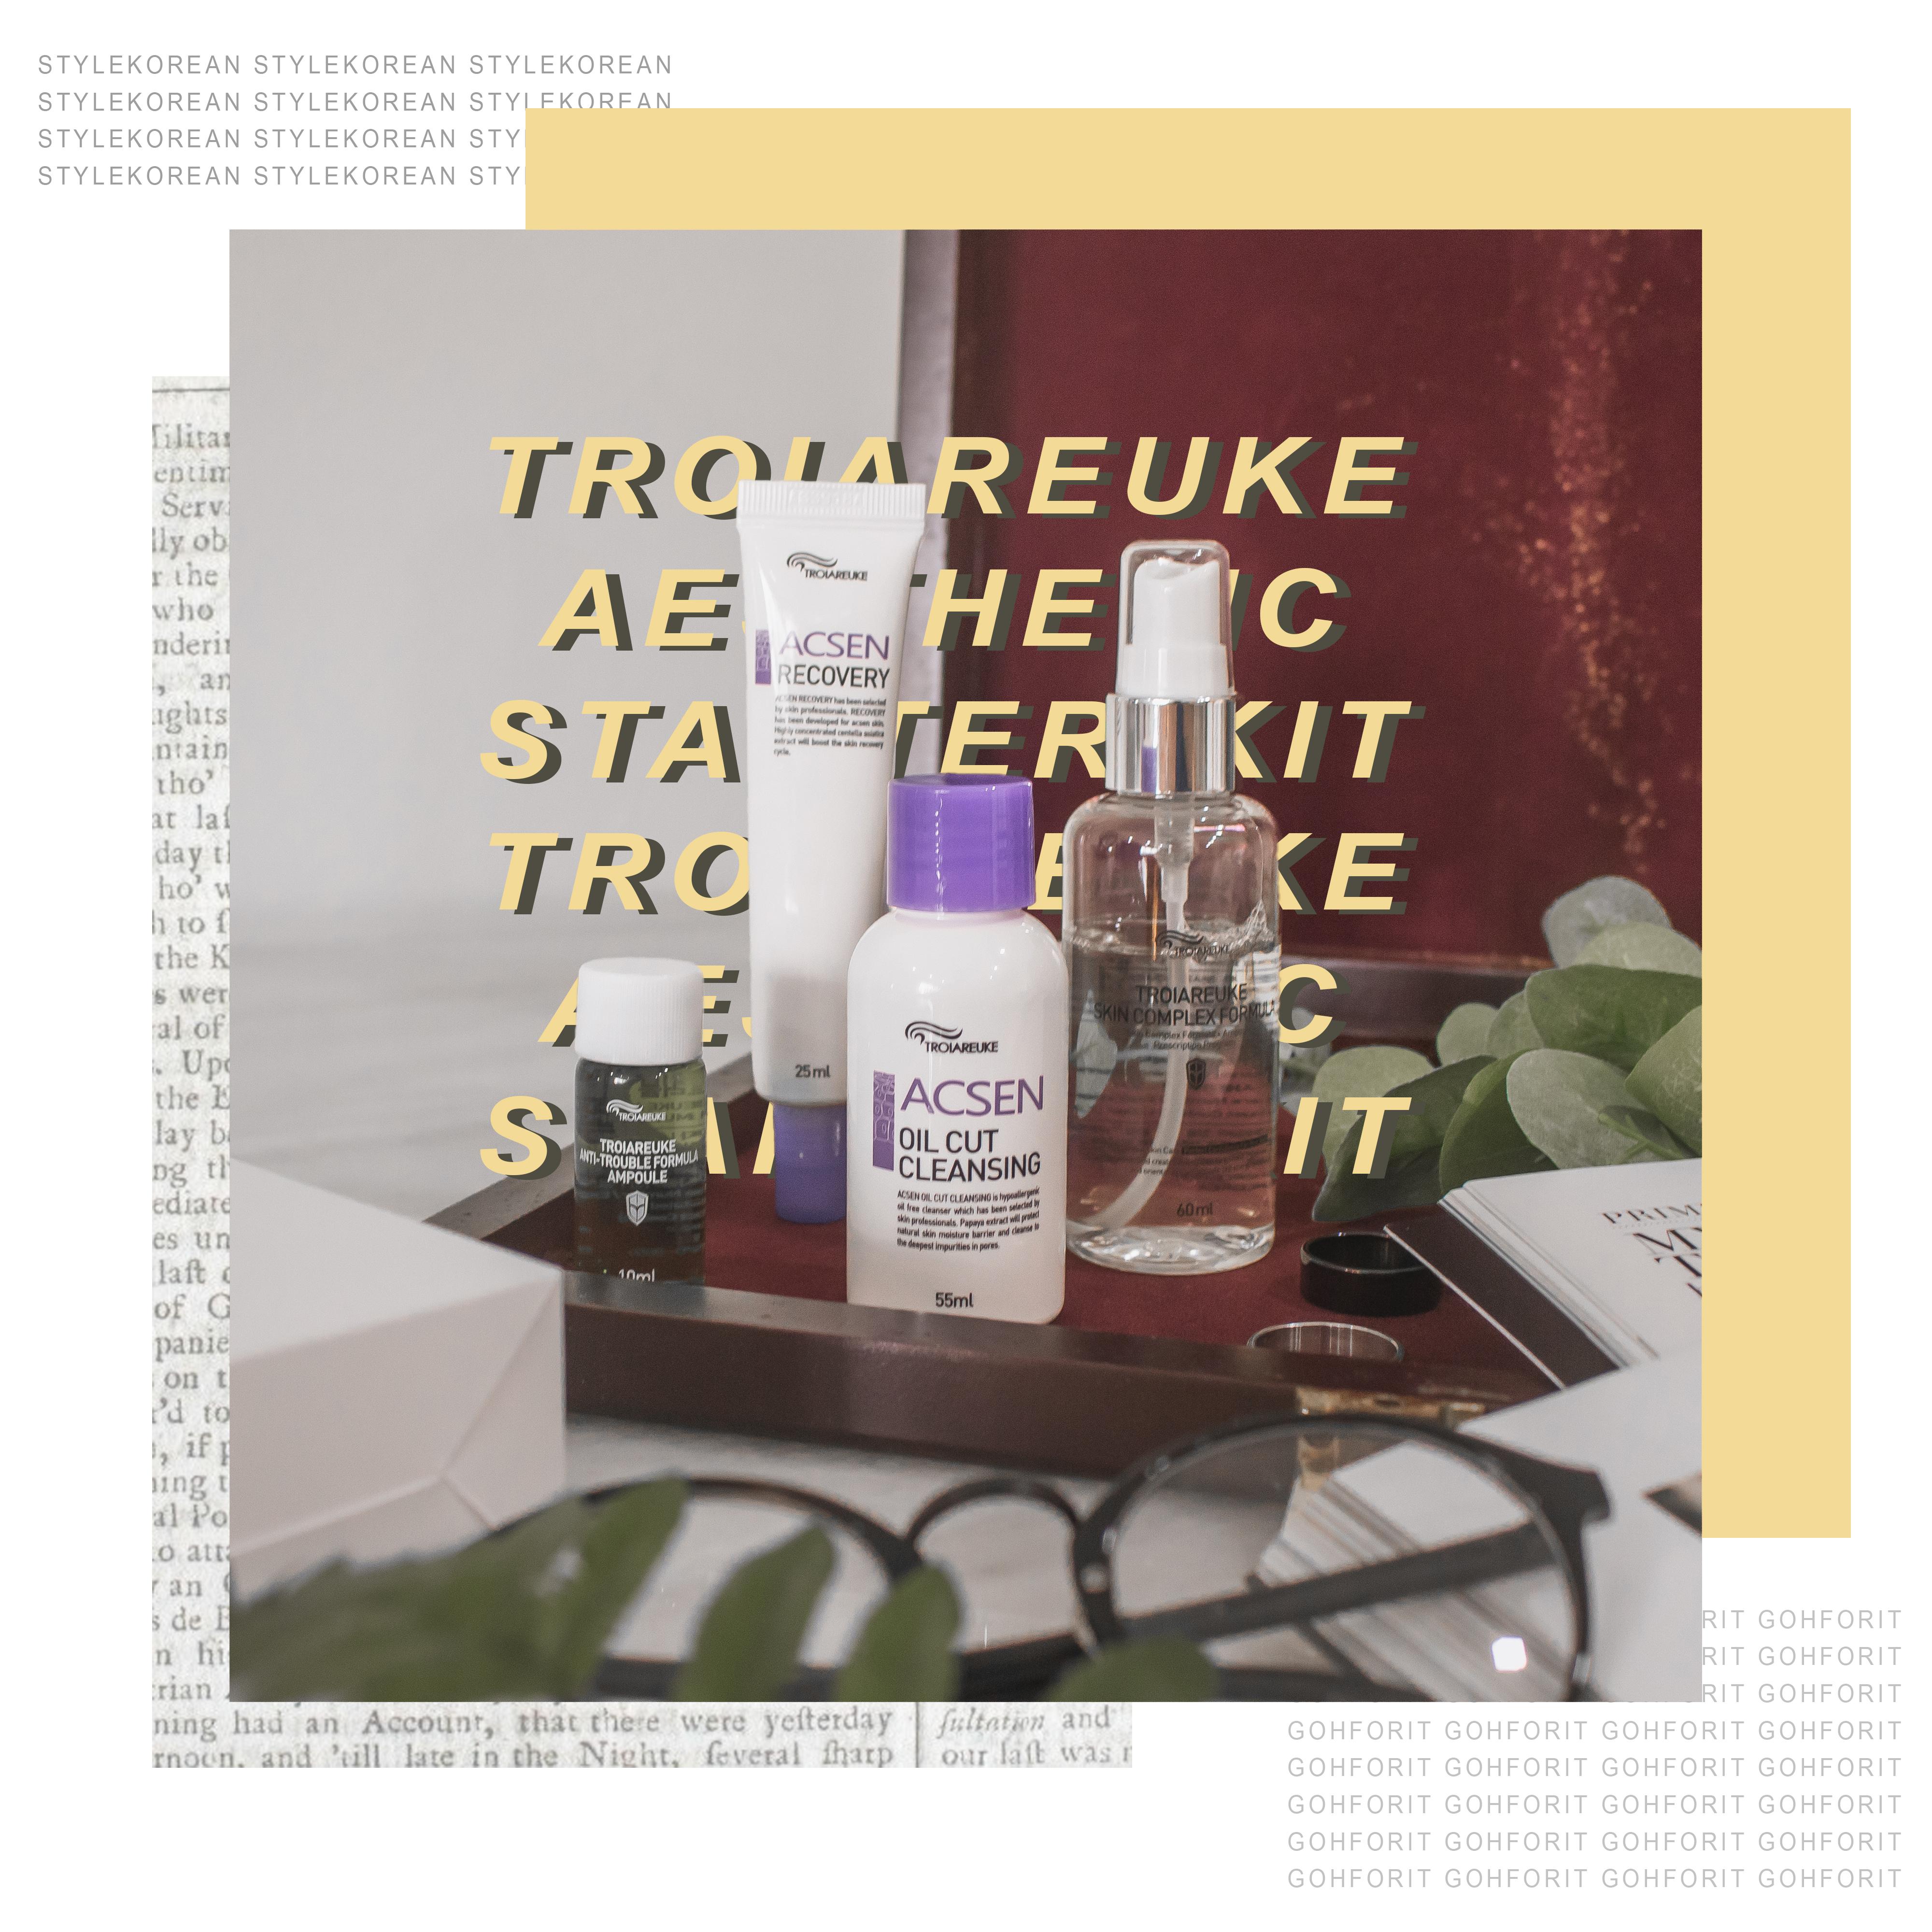 troiareuke aesthetic starter kit_2